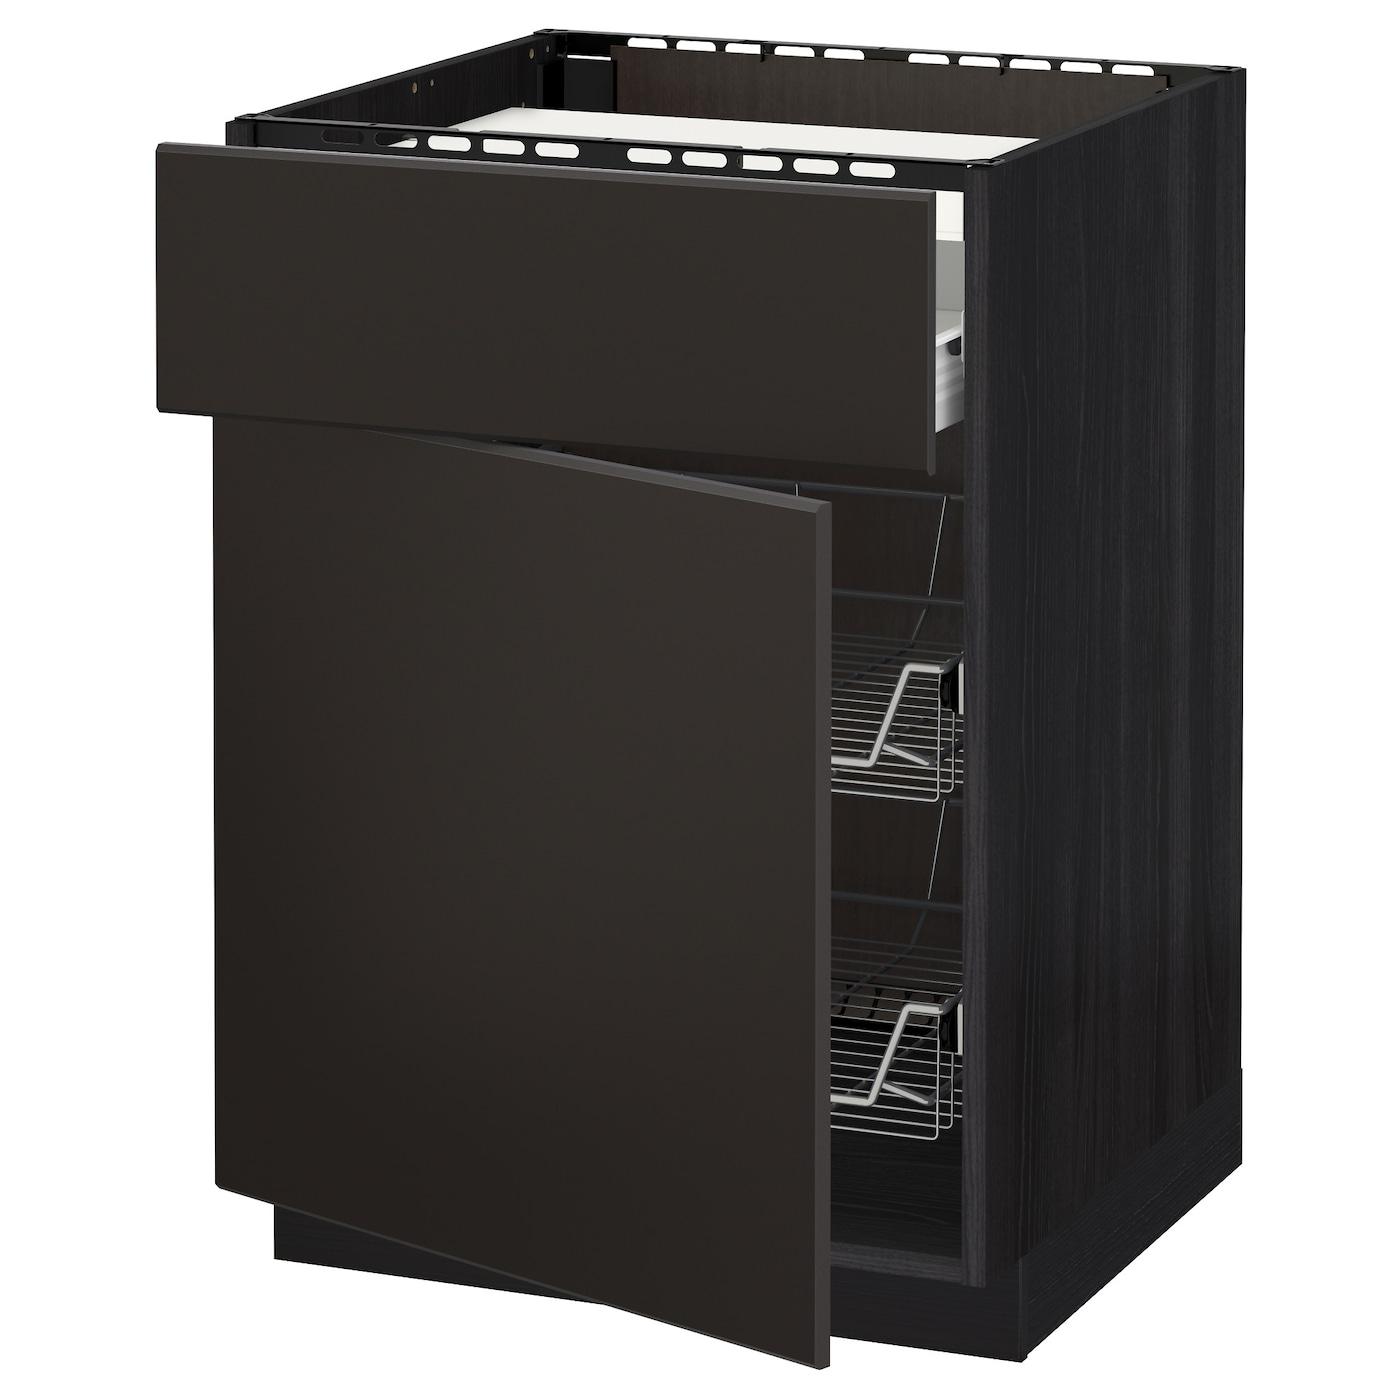 metod f rvara onderkast kookplaat la 2 draadmand zwart kungsbacka antraciet 60 x 60 cm ikea. Black Bedroom Furniture Sets. Home Design Ideas